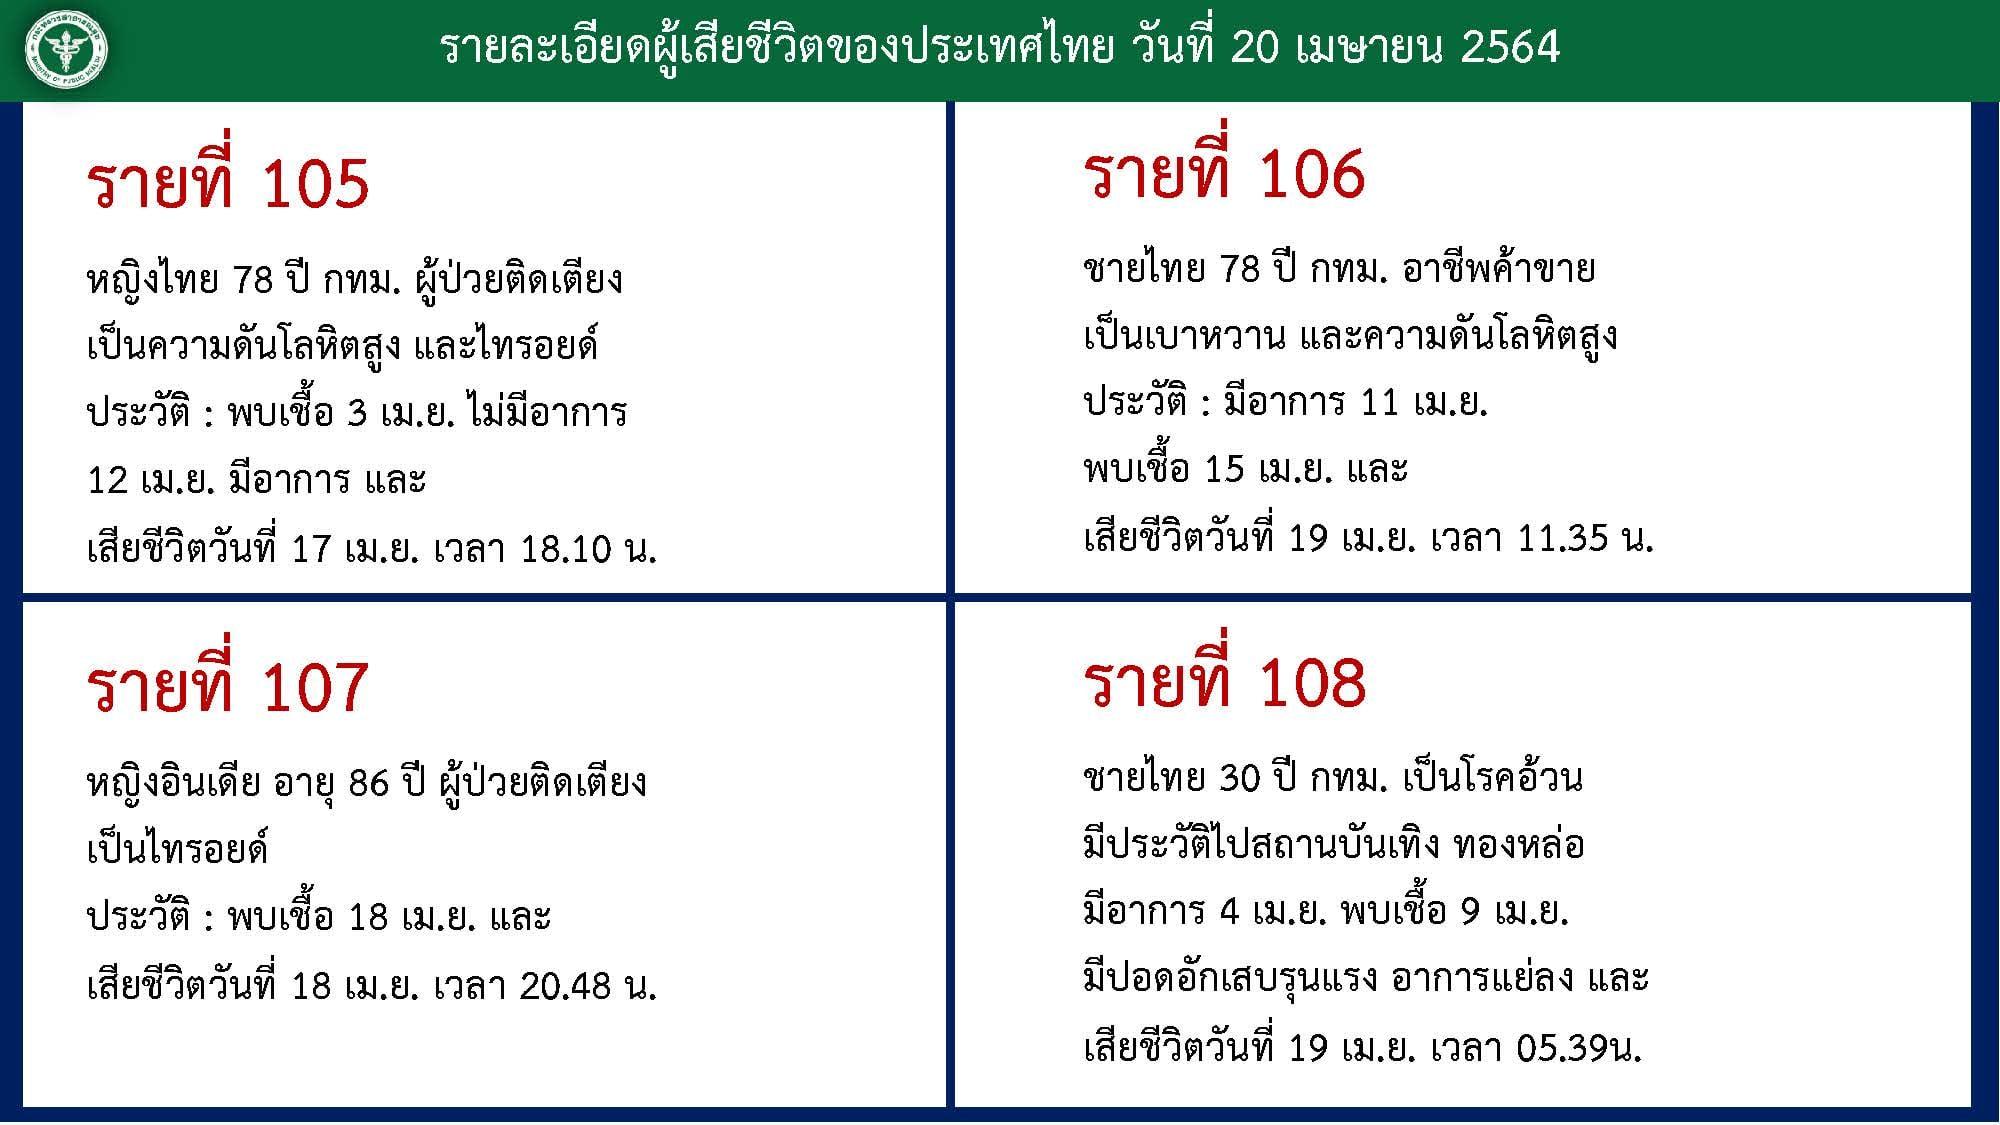 www.thaiguide.dk/images/forum/covid19/dode%2020-04-21.jpg